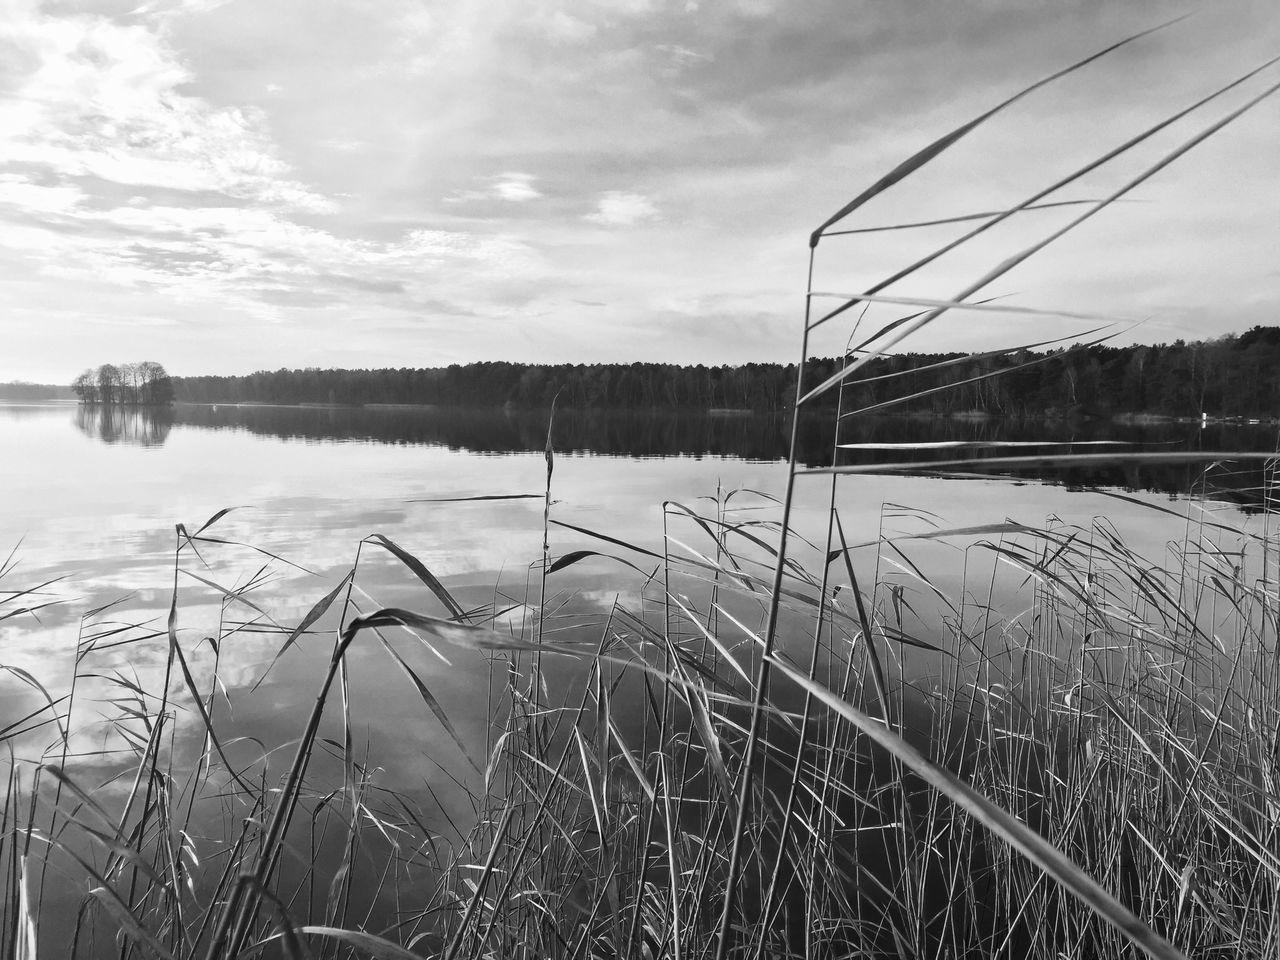 Reed Growing On Lakeshore Against Sky